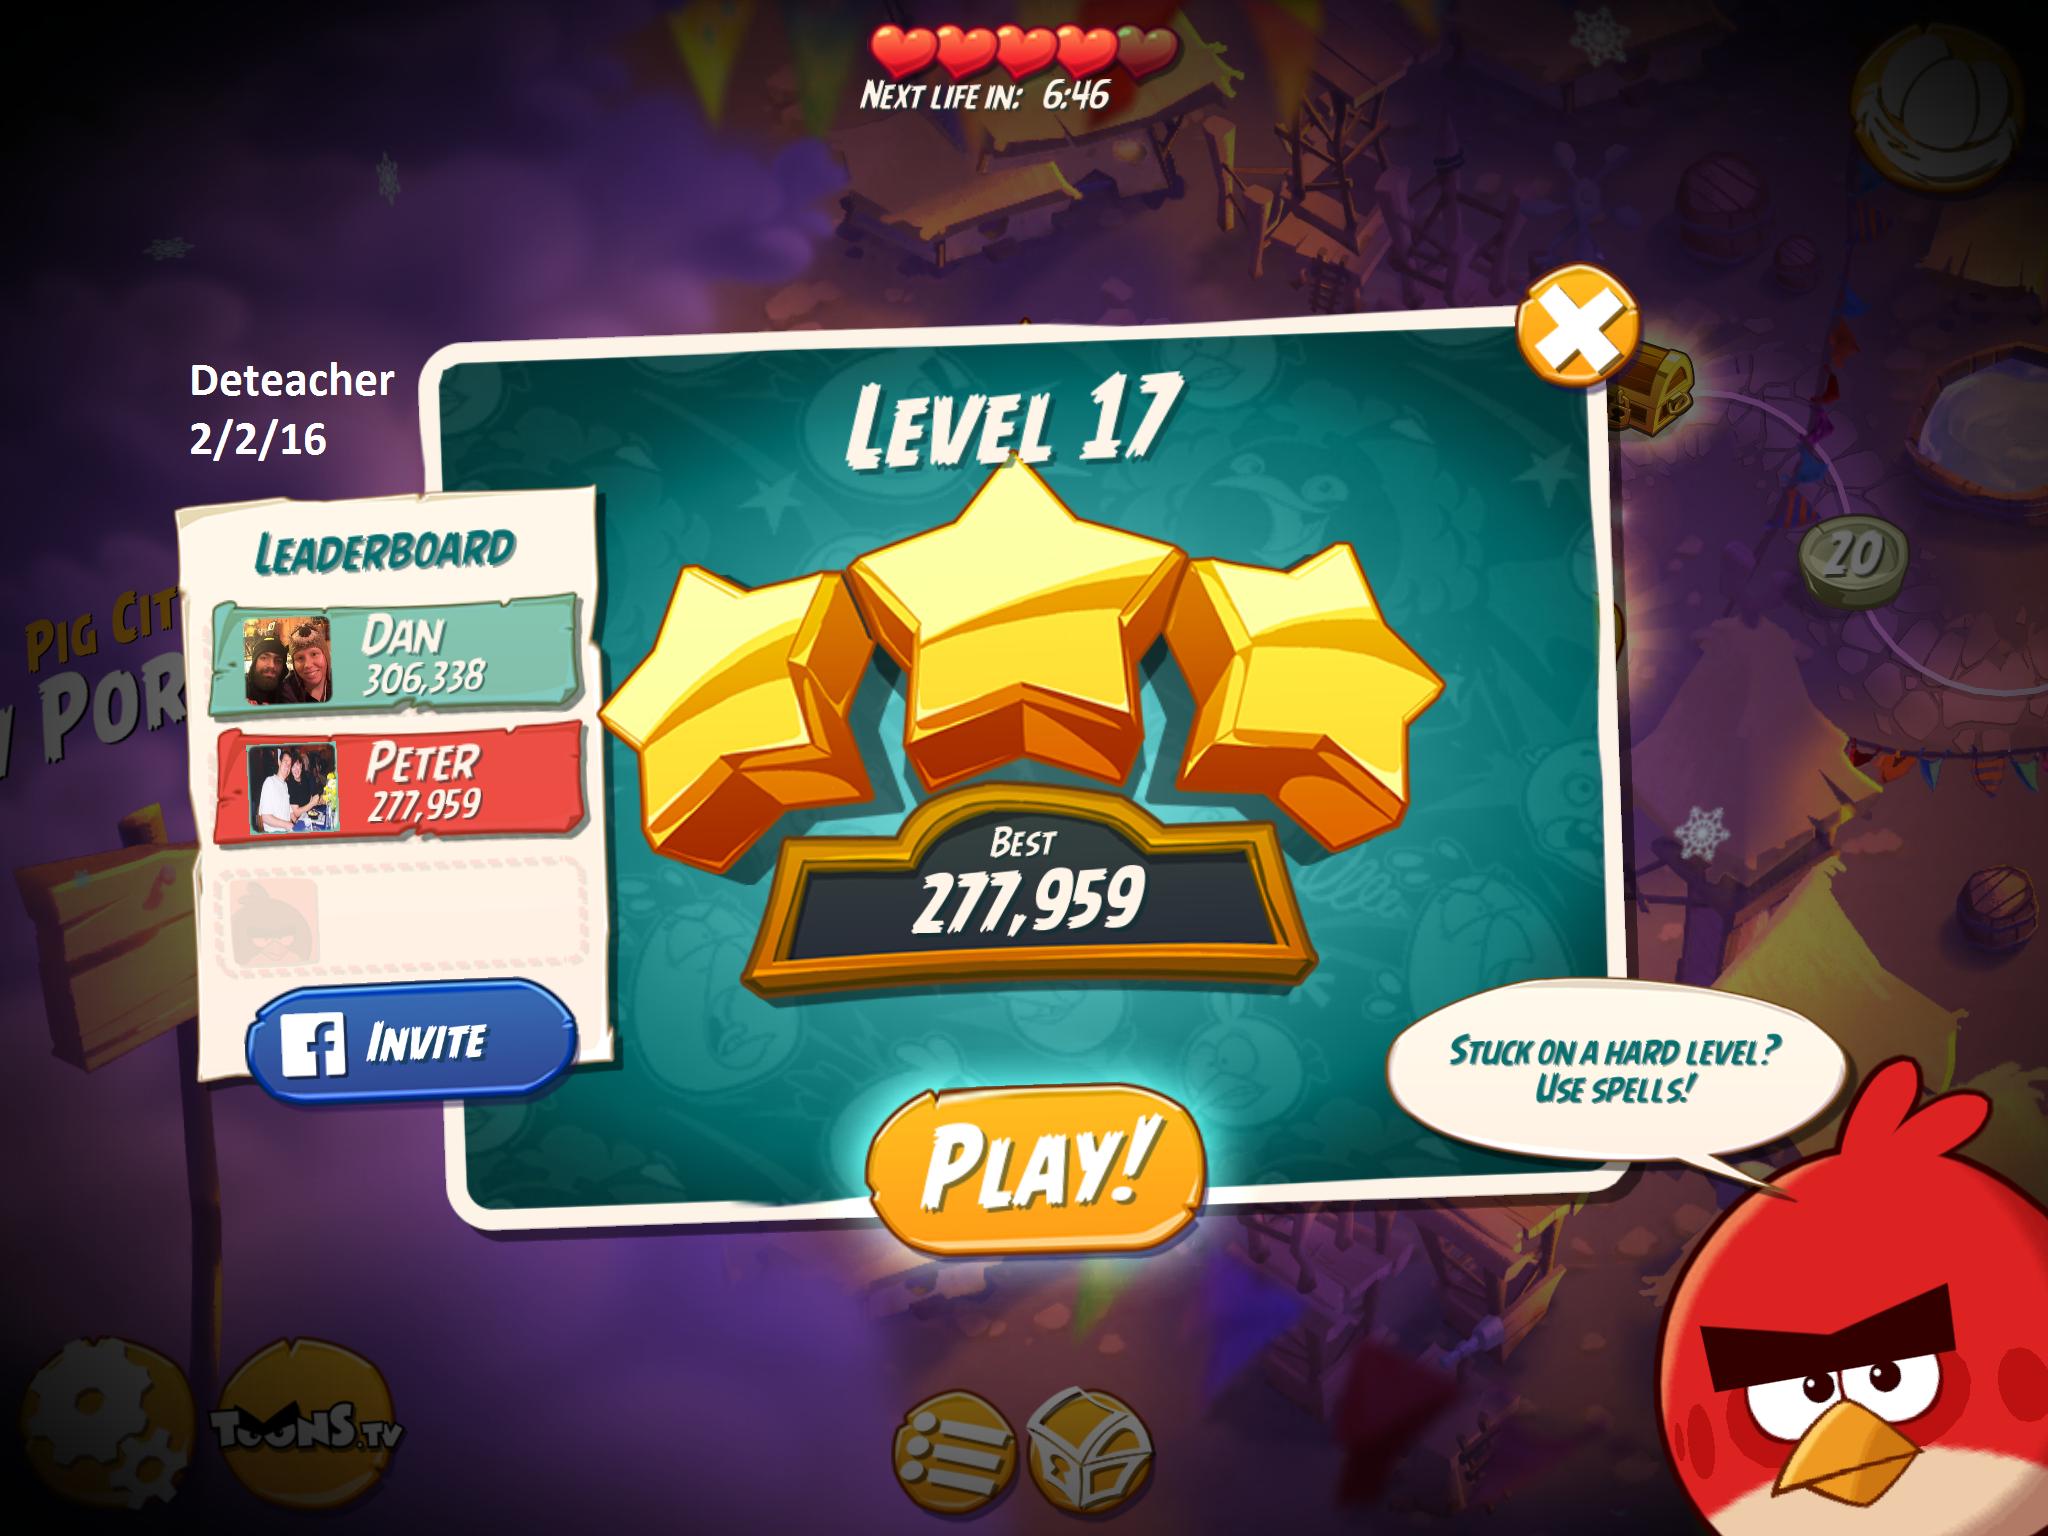 Deteacher: Angry Birds 2: Level 17 (iOS) 277,959 points on 2016-02-02 18:42:50